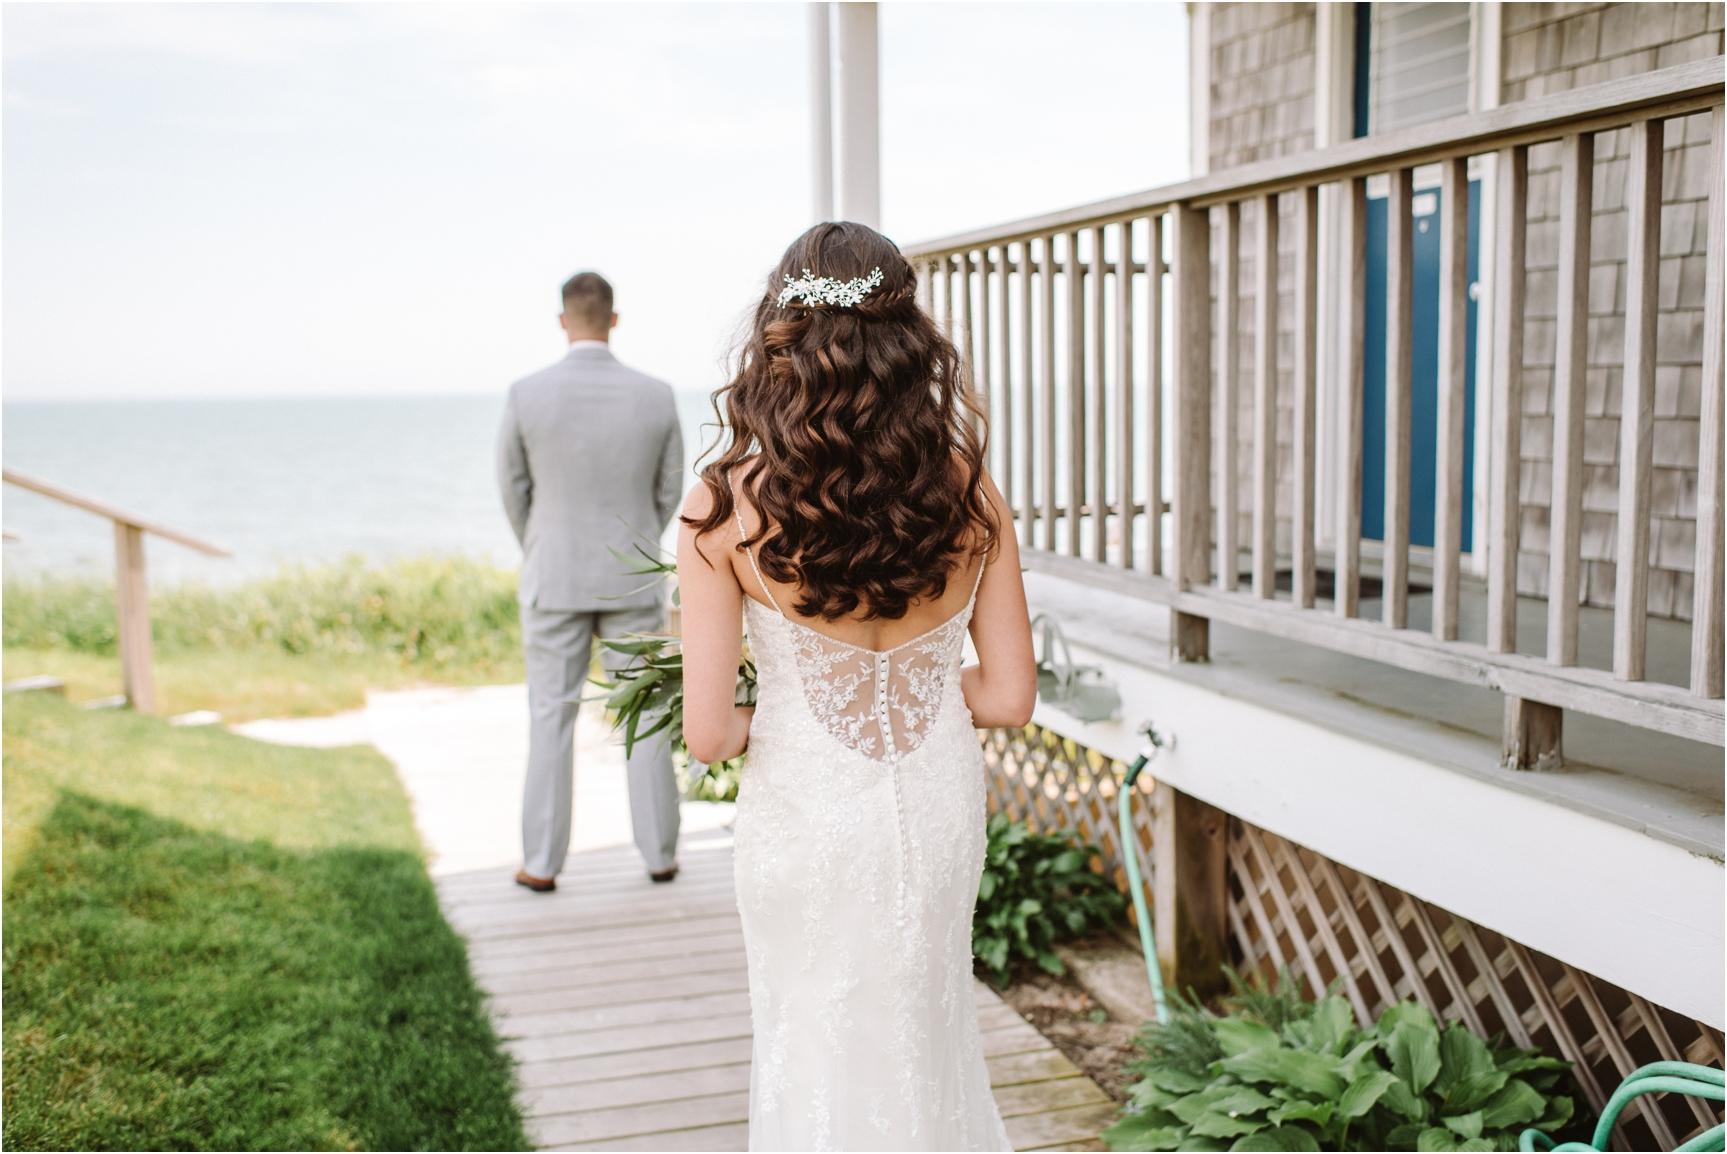 Sarah & Sam Pelham House Cape Cod Wedding Photographer-38.jpg